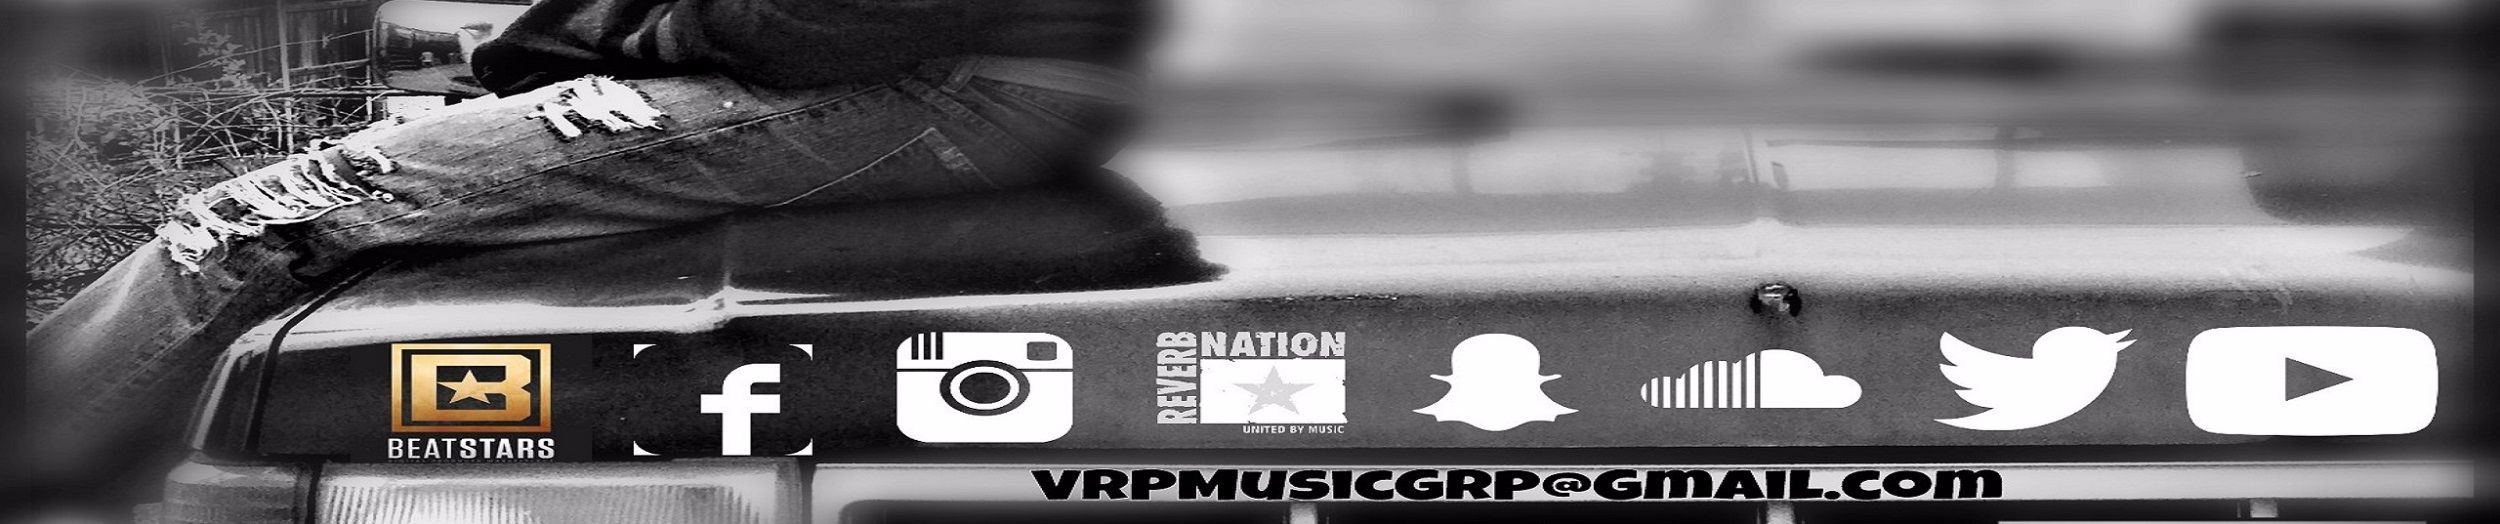 Royale Lez (Muzik) | Free Listening on SoundCloud